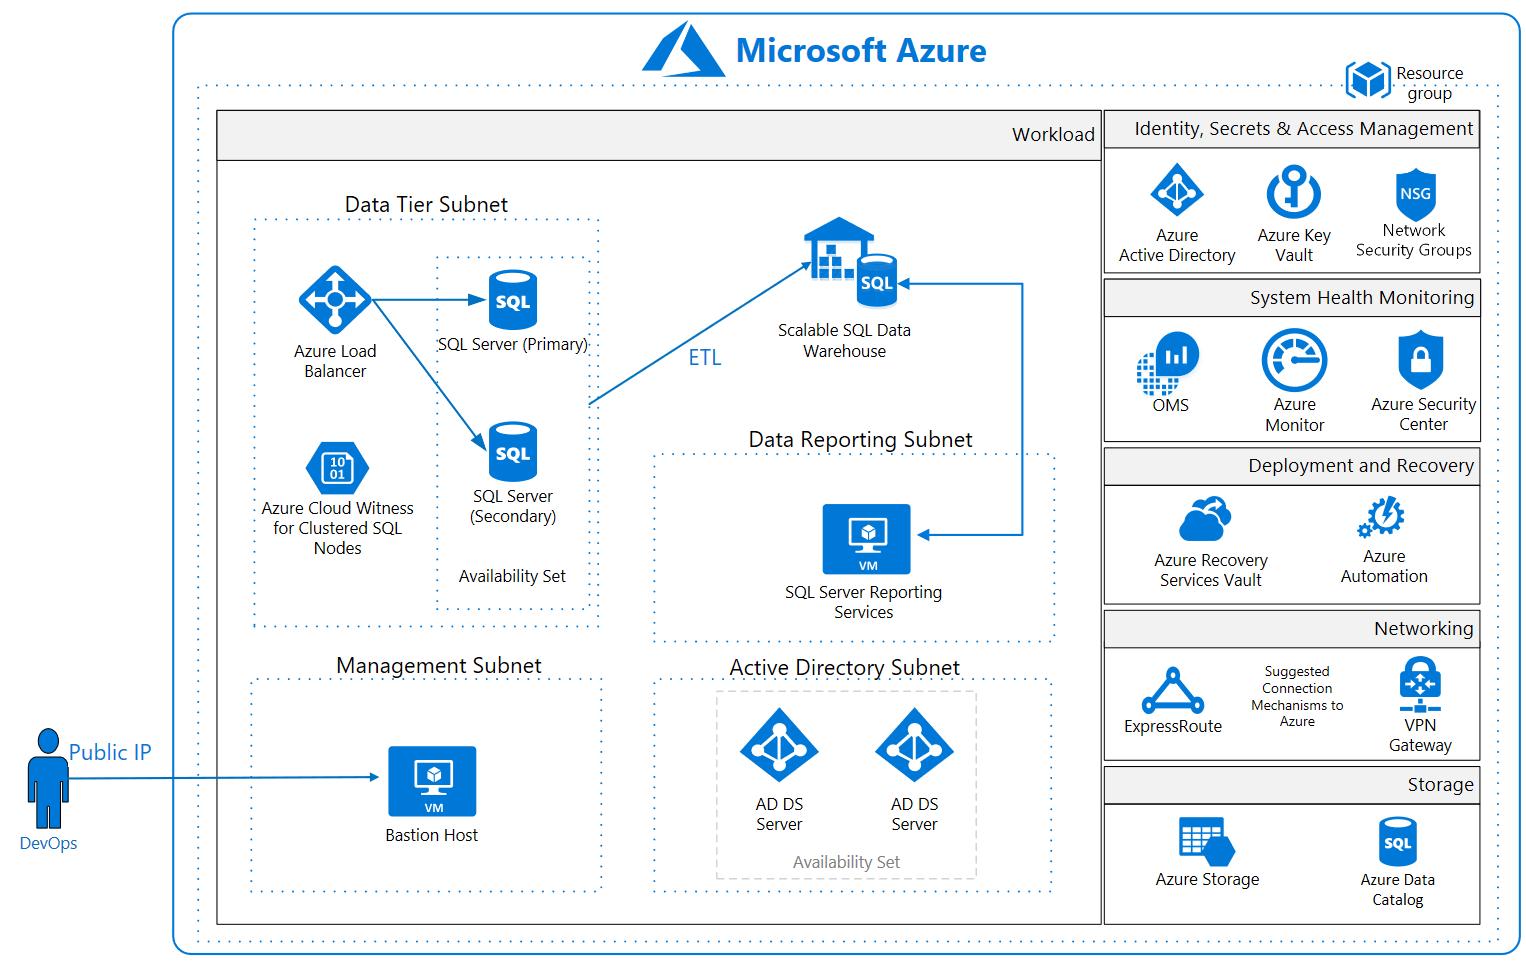 Diagrama De Arquitectura De Referencia De Data Warehouse Para El Rgpd Blueprints Service Blueprint Moodboard App